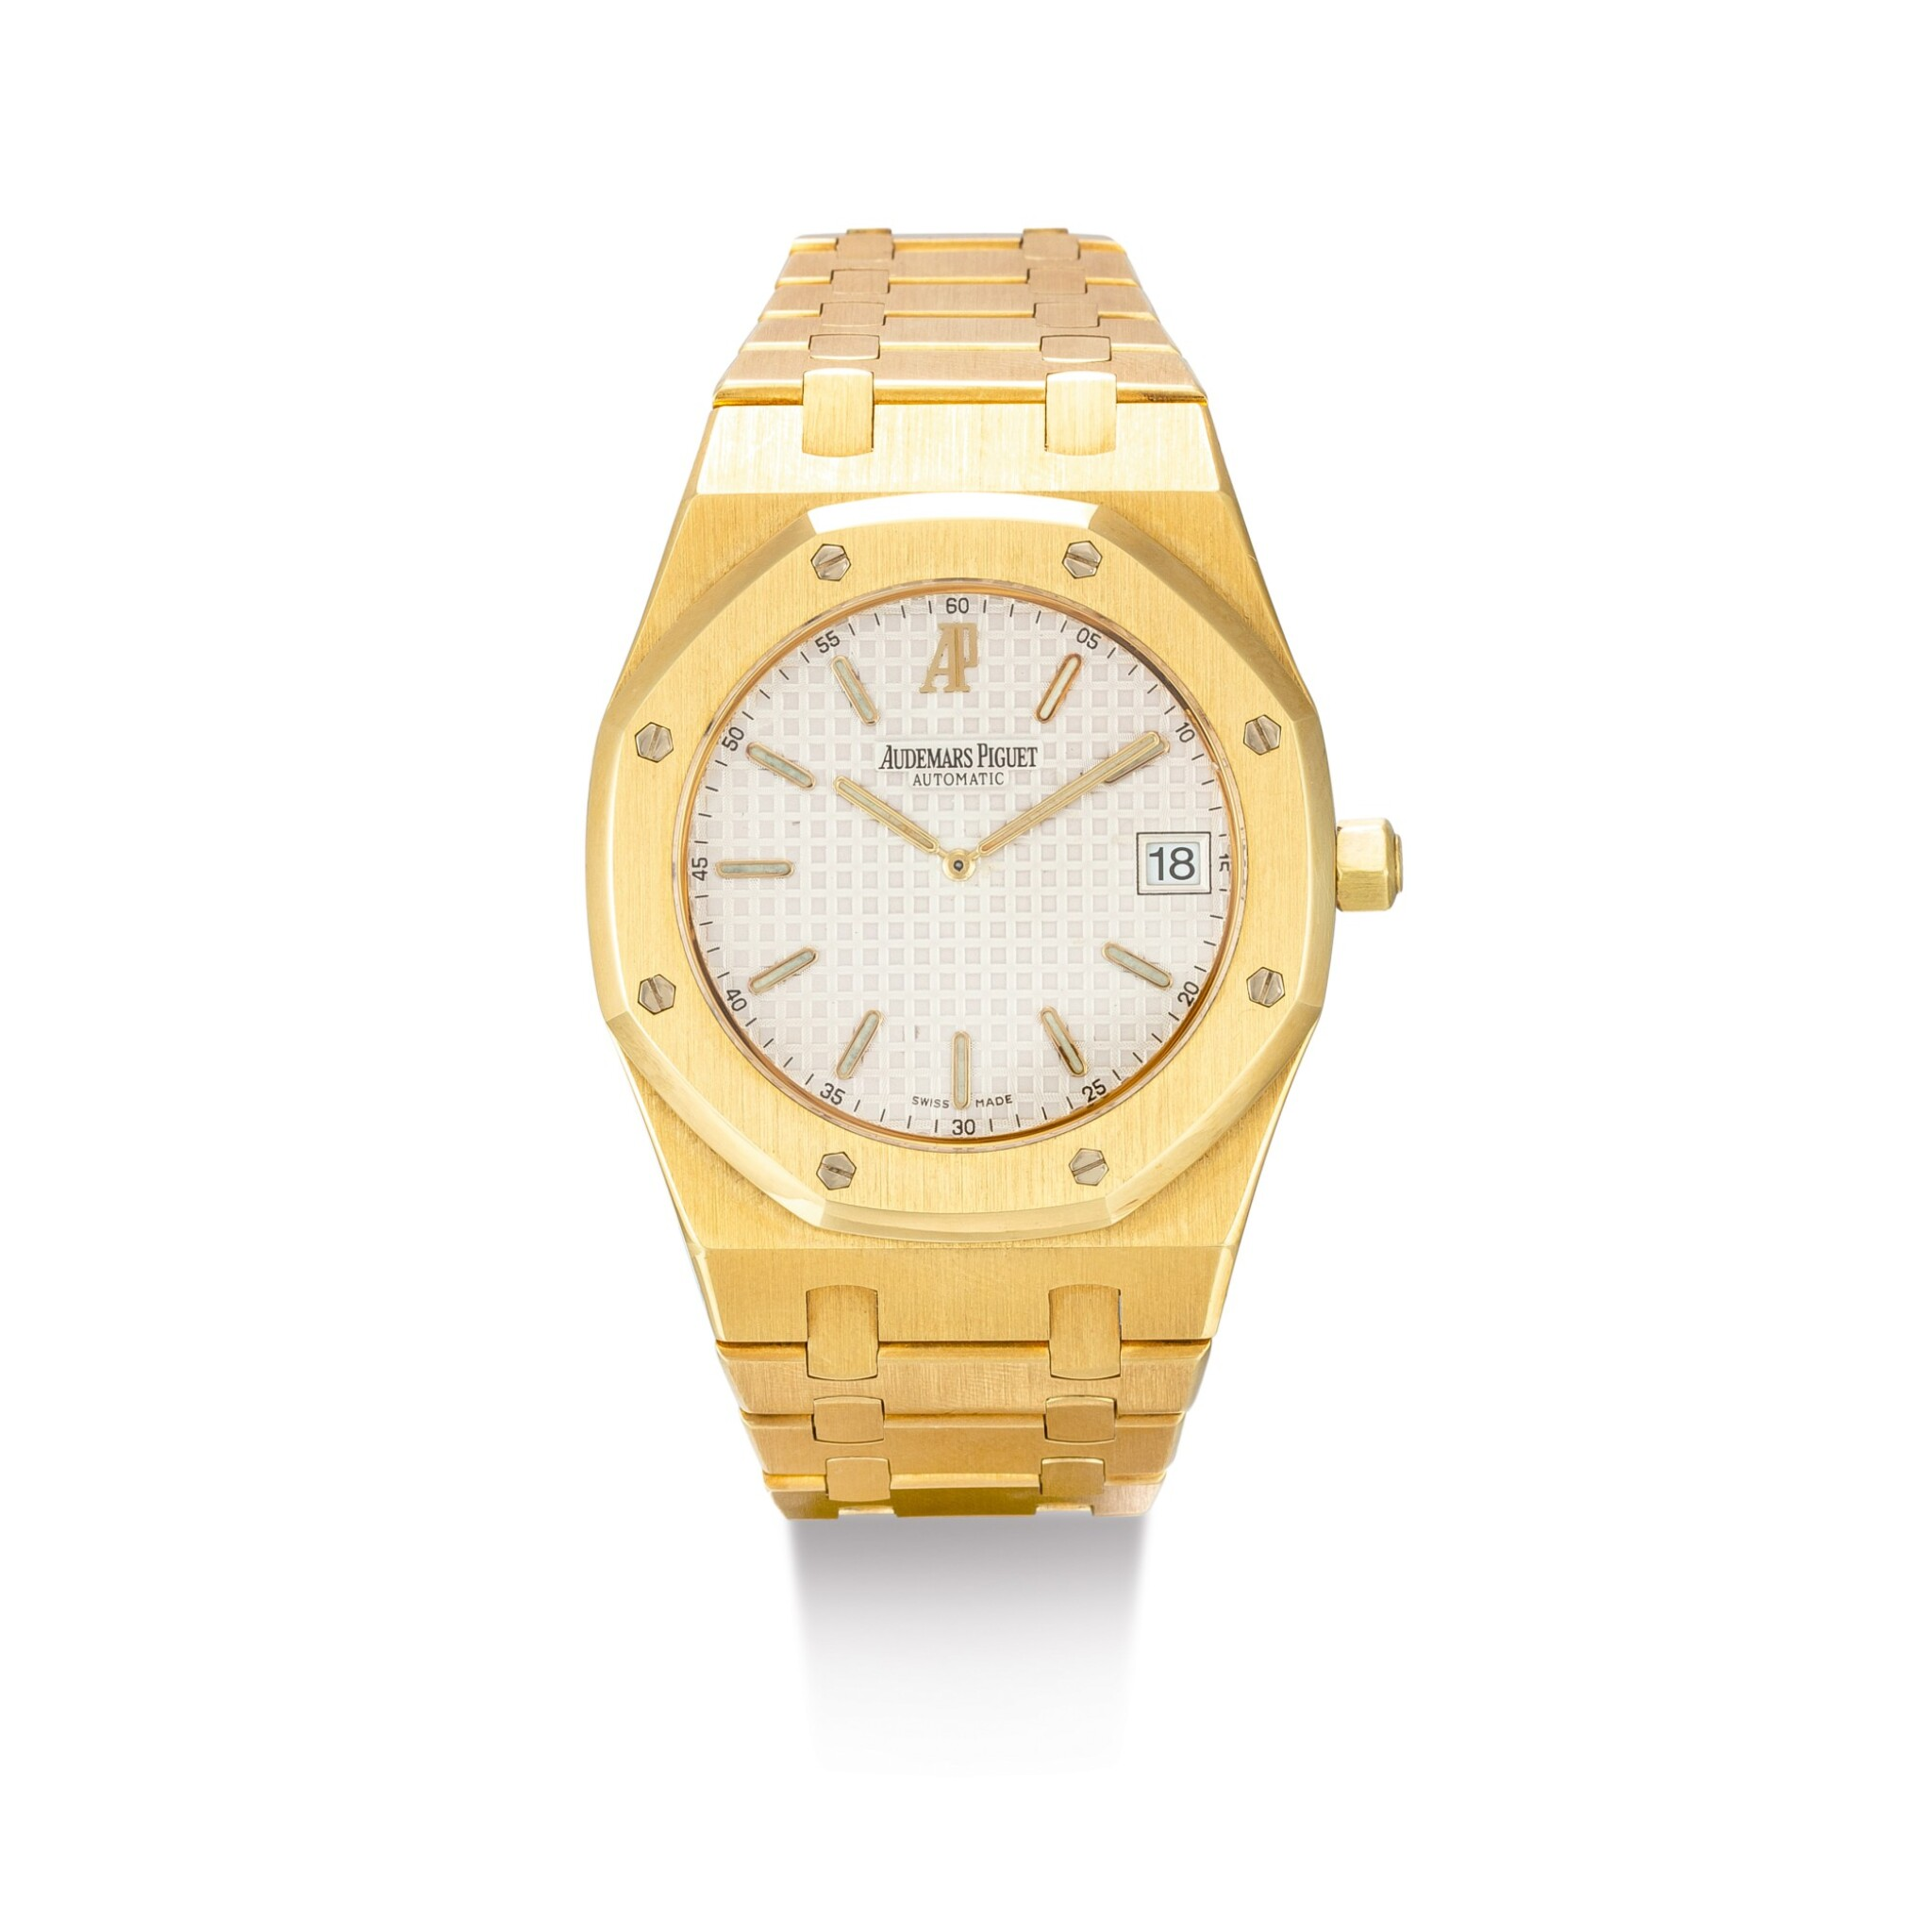 "View full screen - View 1 of Lot 2091. AUDEMARS PIGUET | ROYAL OAK, REFERENCE 15202BA, A YELLOW GOLD BRACELET WATCH WITH DATE, CIRCA 2000 | 愛彼 | ""Royal Oak 型號15202BA 黃金鏈帶腕錶,備日期顯示,機芯編號415023,錶殼編號E-41585及14,約2000年製""."